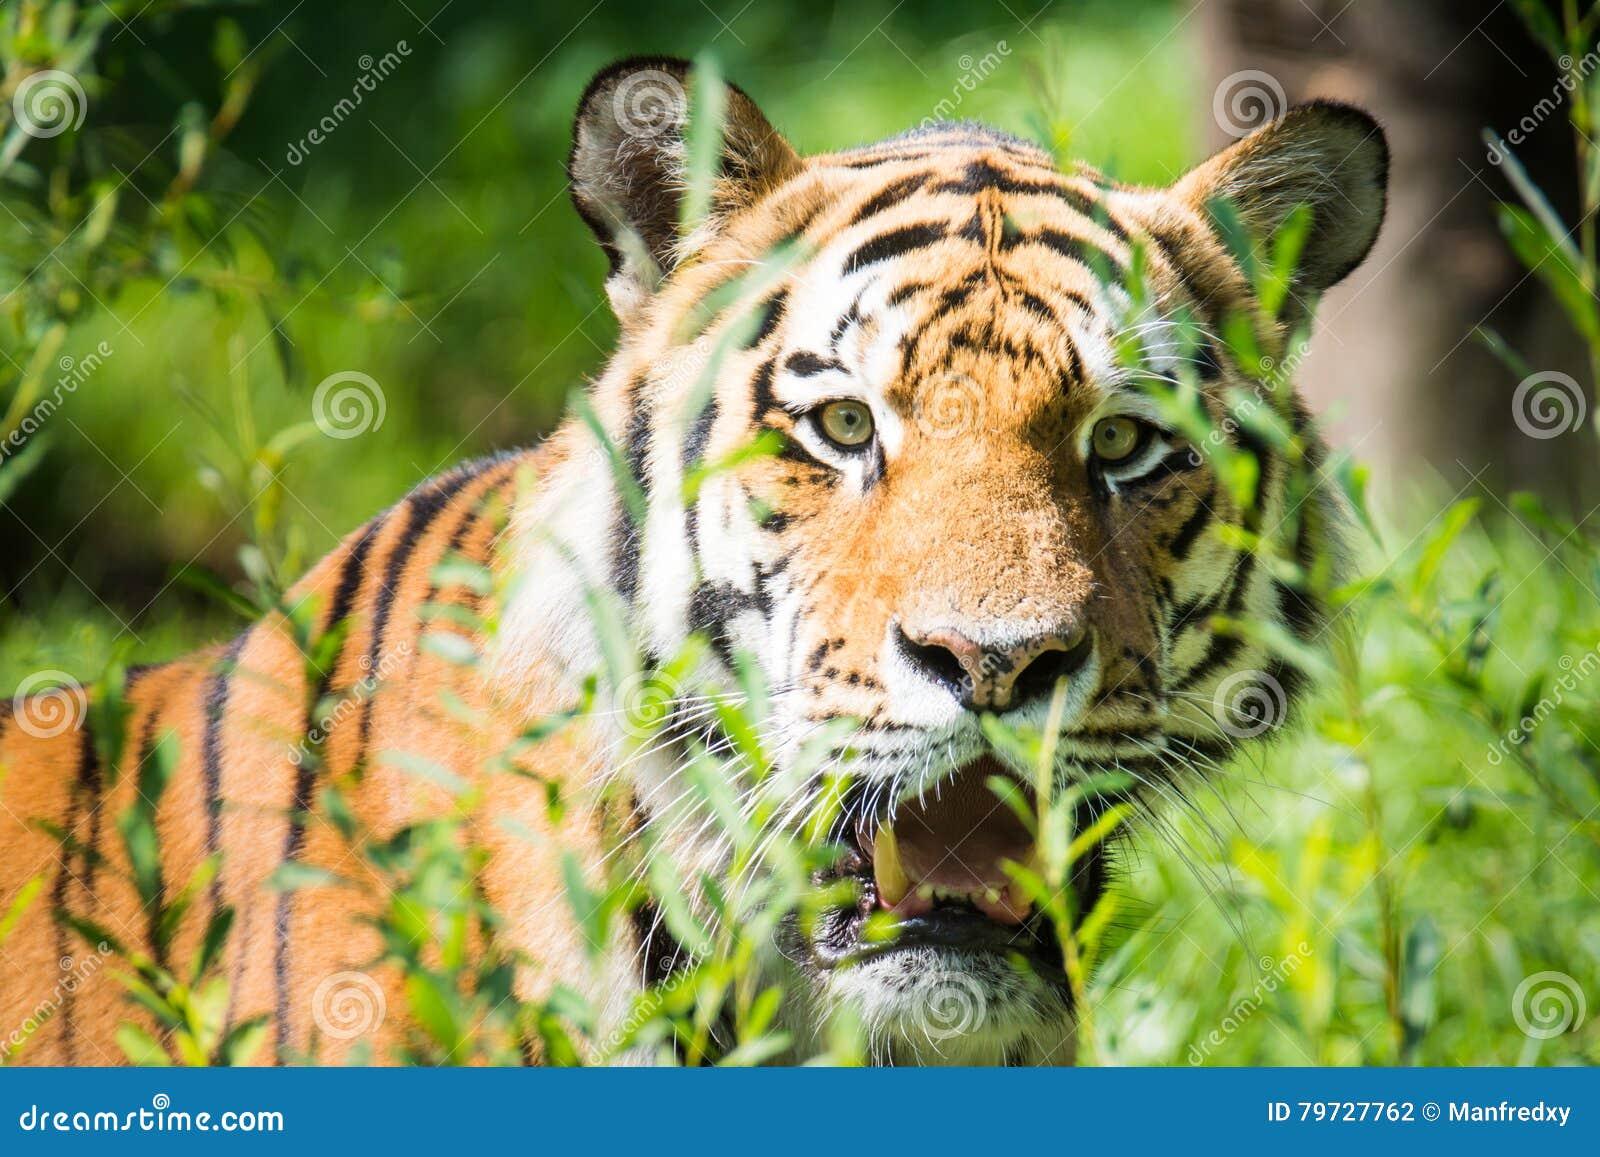 Tigre siberiano salvaje en la selva